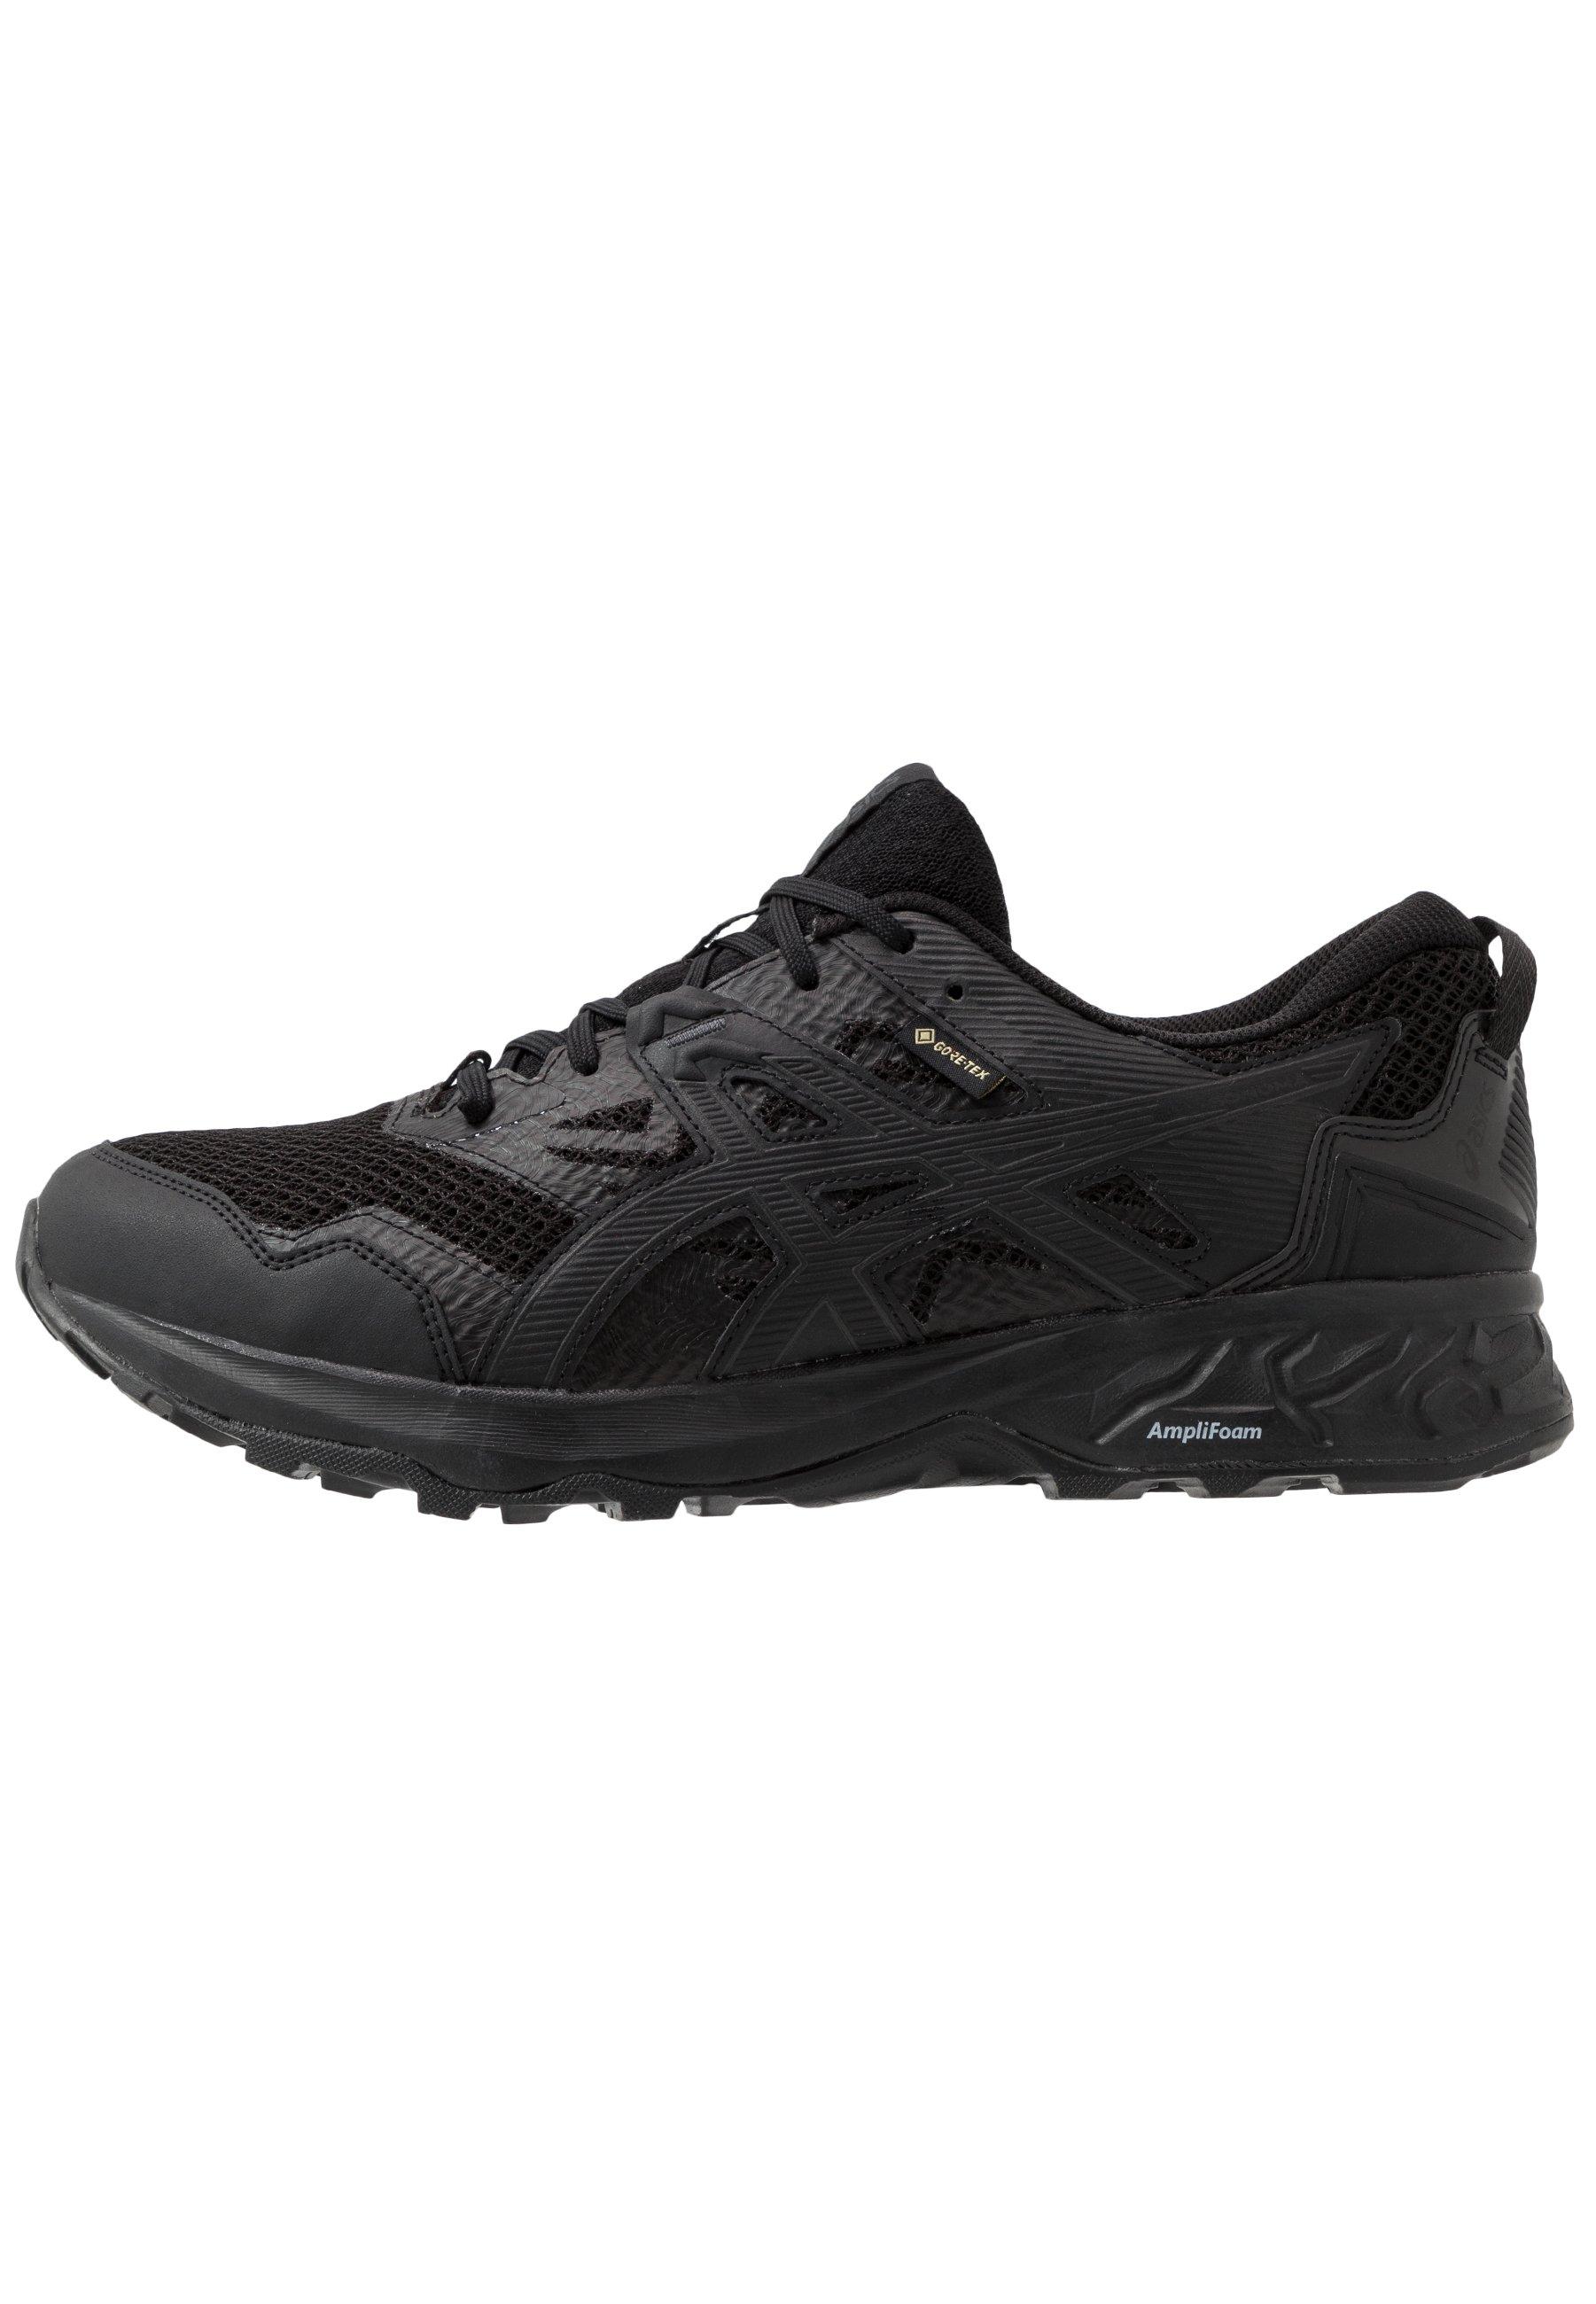 GEL SONOMA 5 G TX Trail hardloopschoenen black